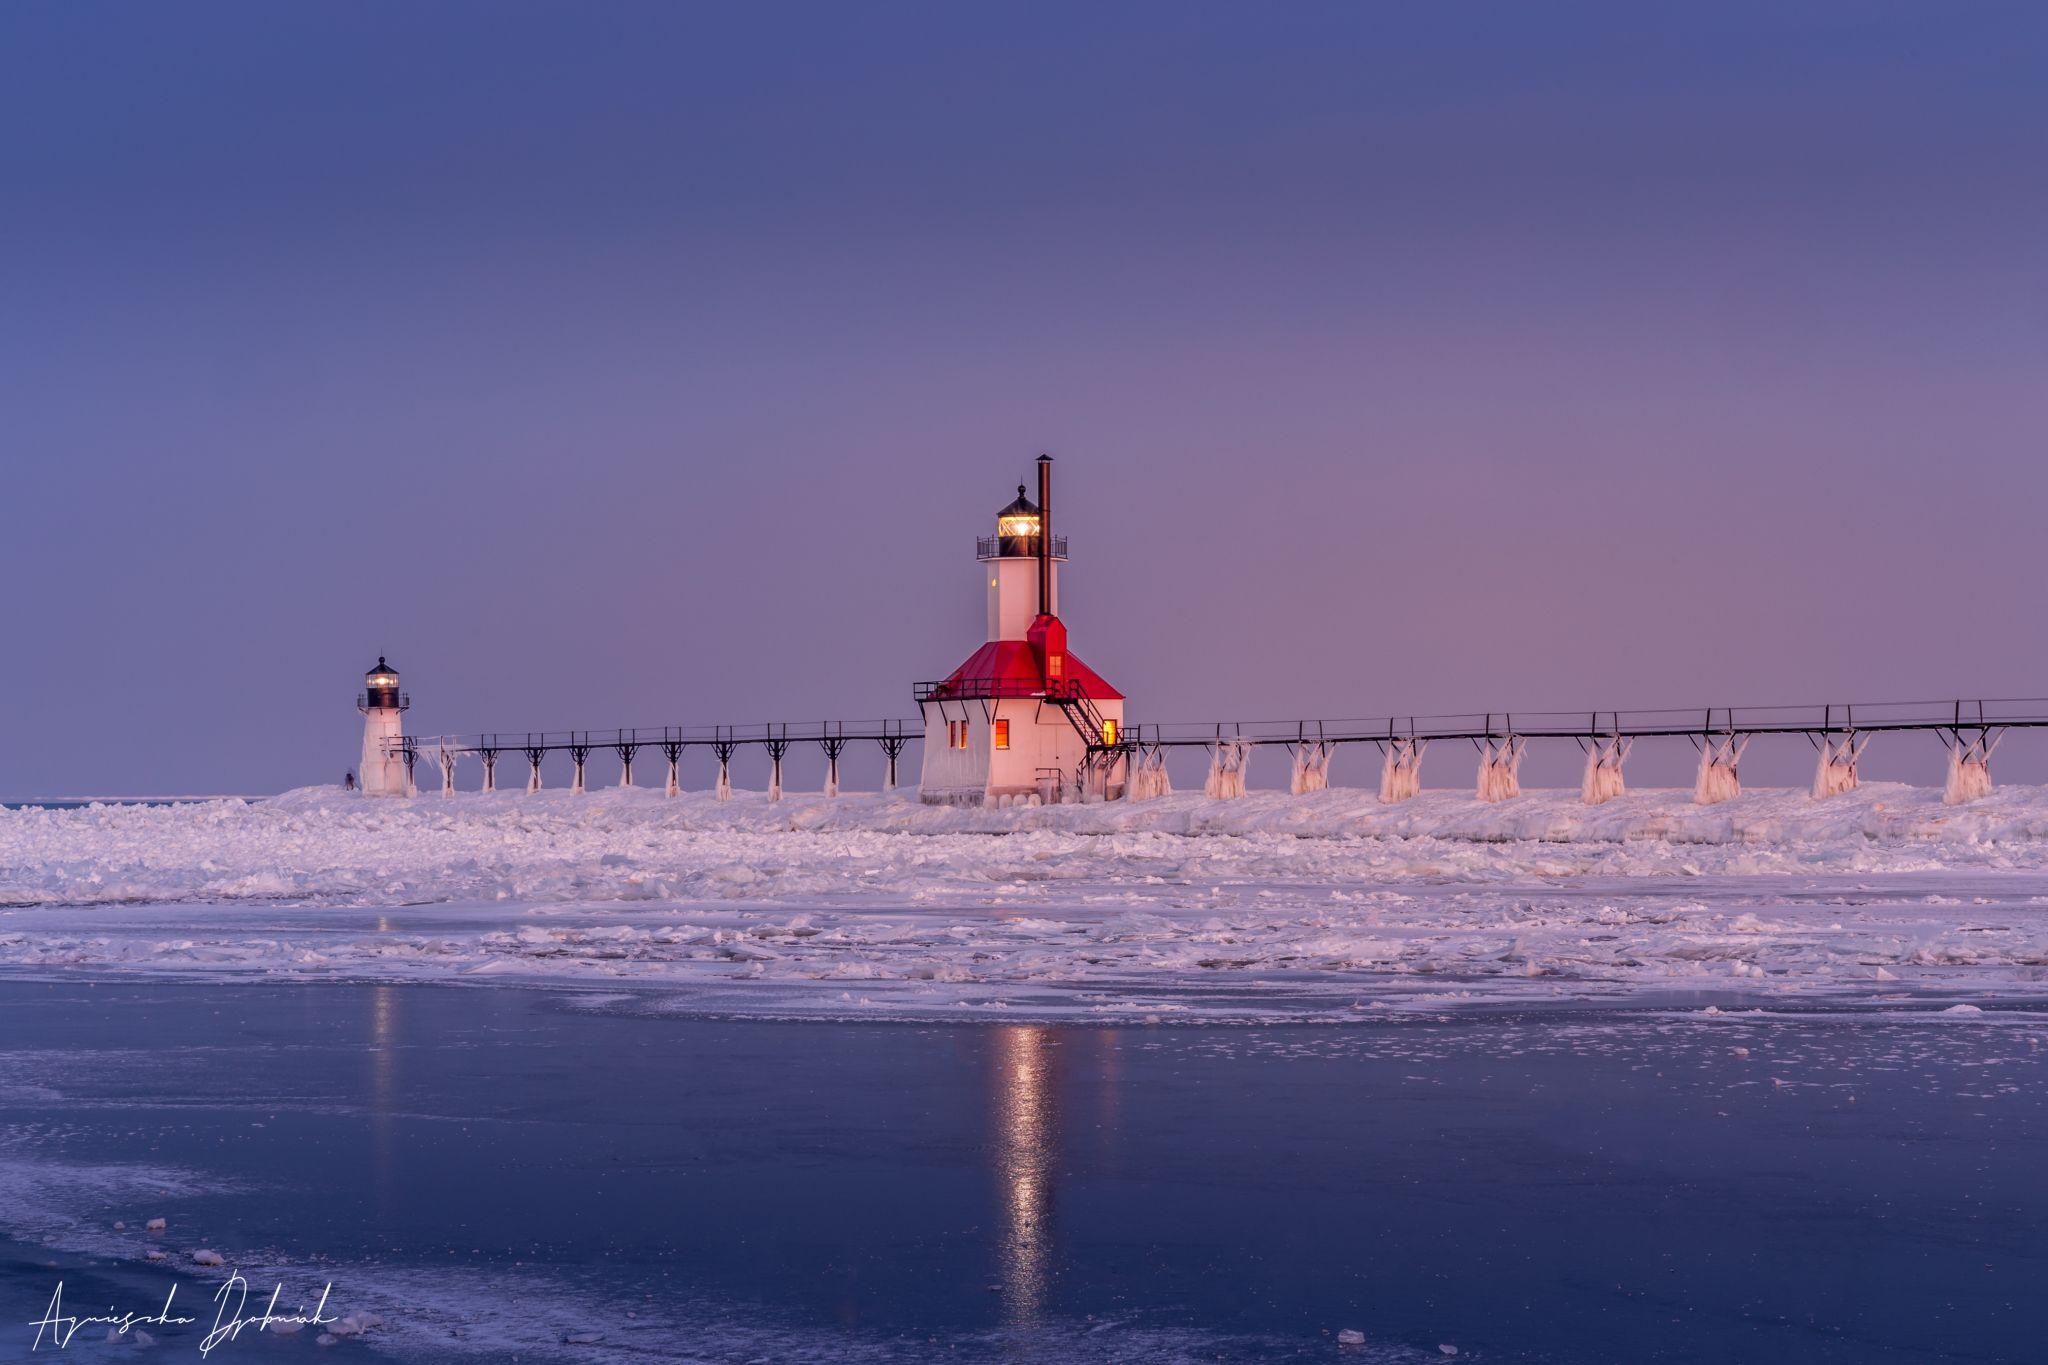 St Joseph North Pier Lighthouse, MI., USA